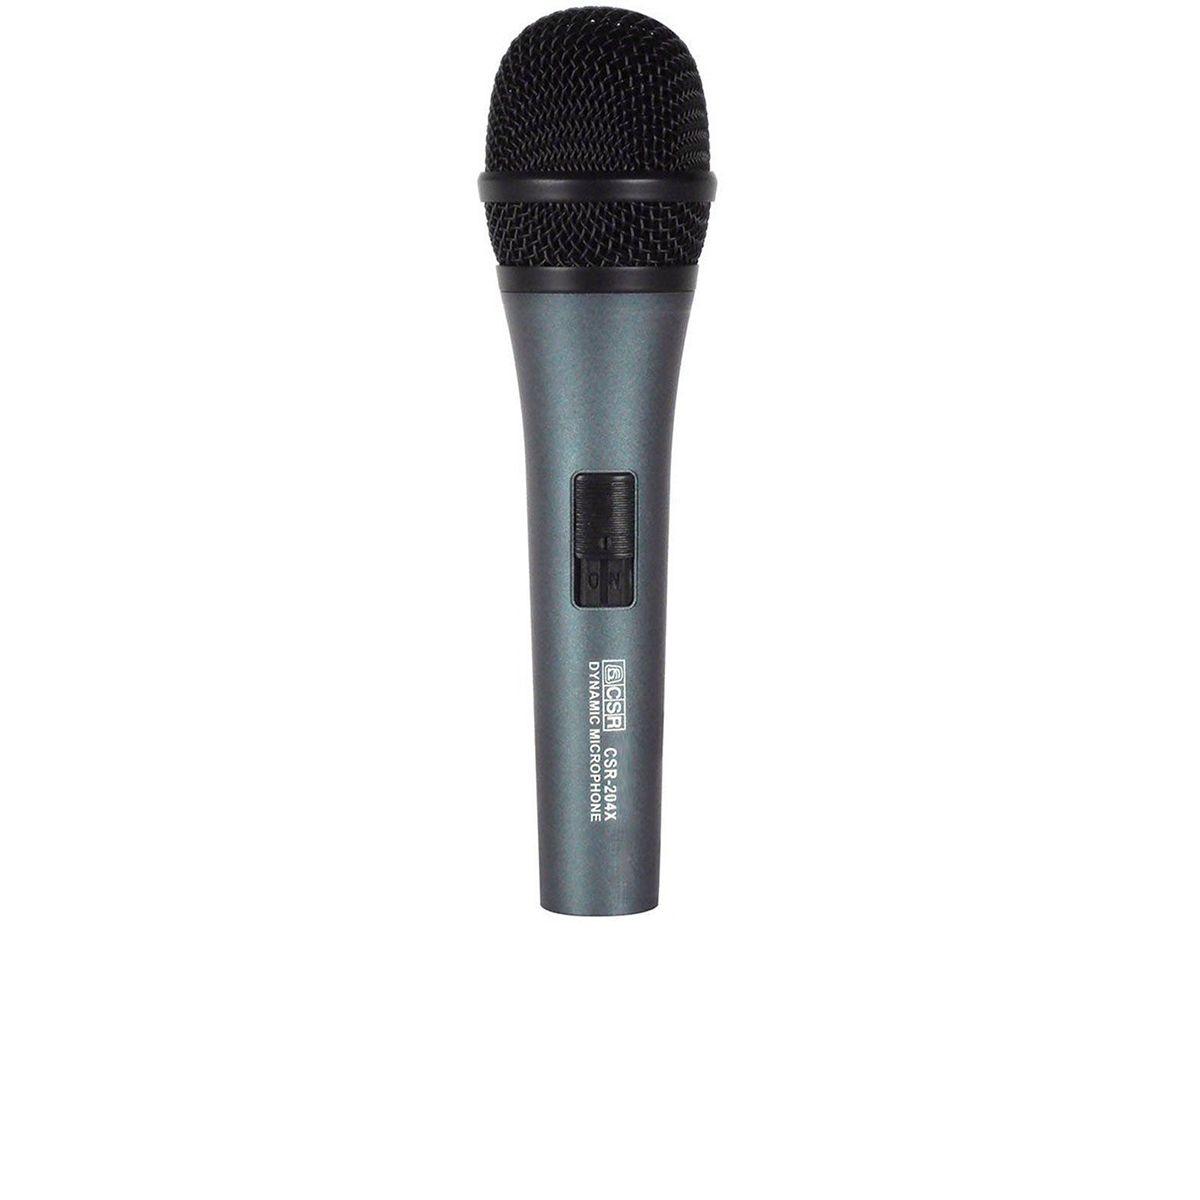 Microfone com Fio CSR CSR-204X